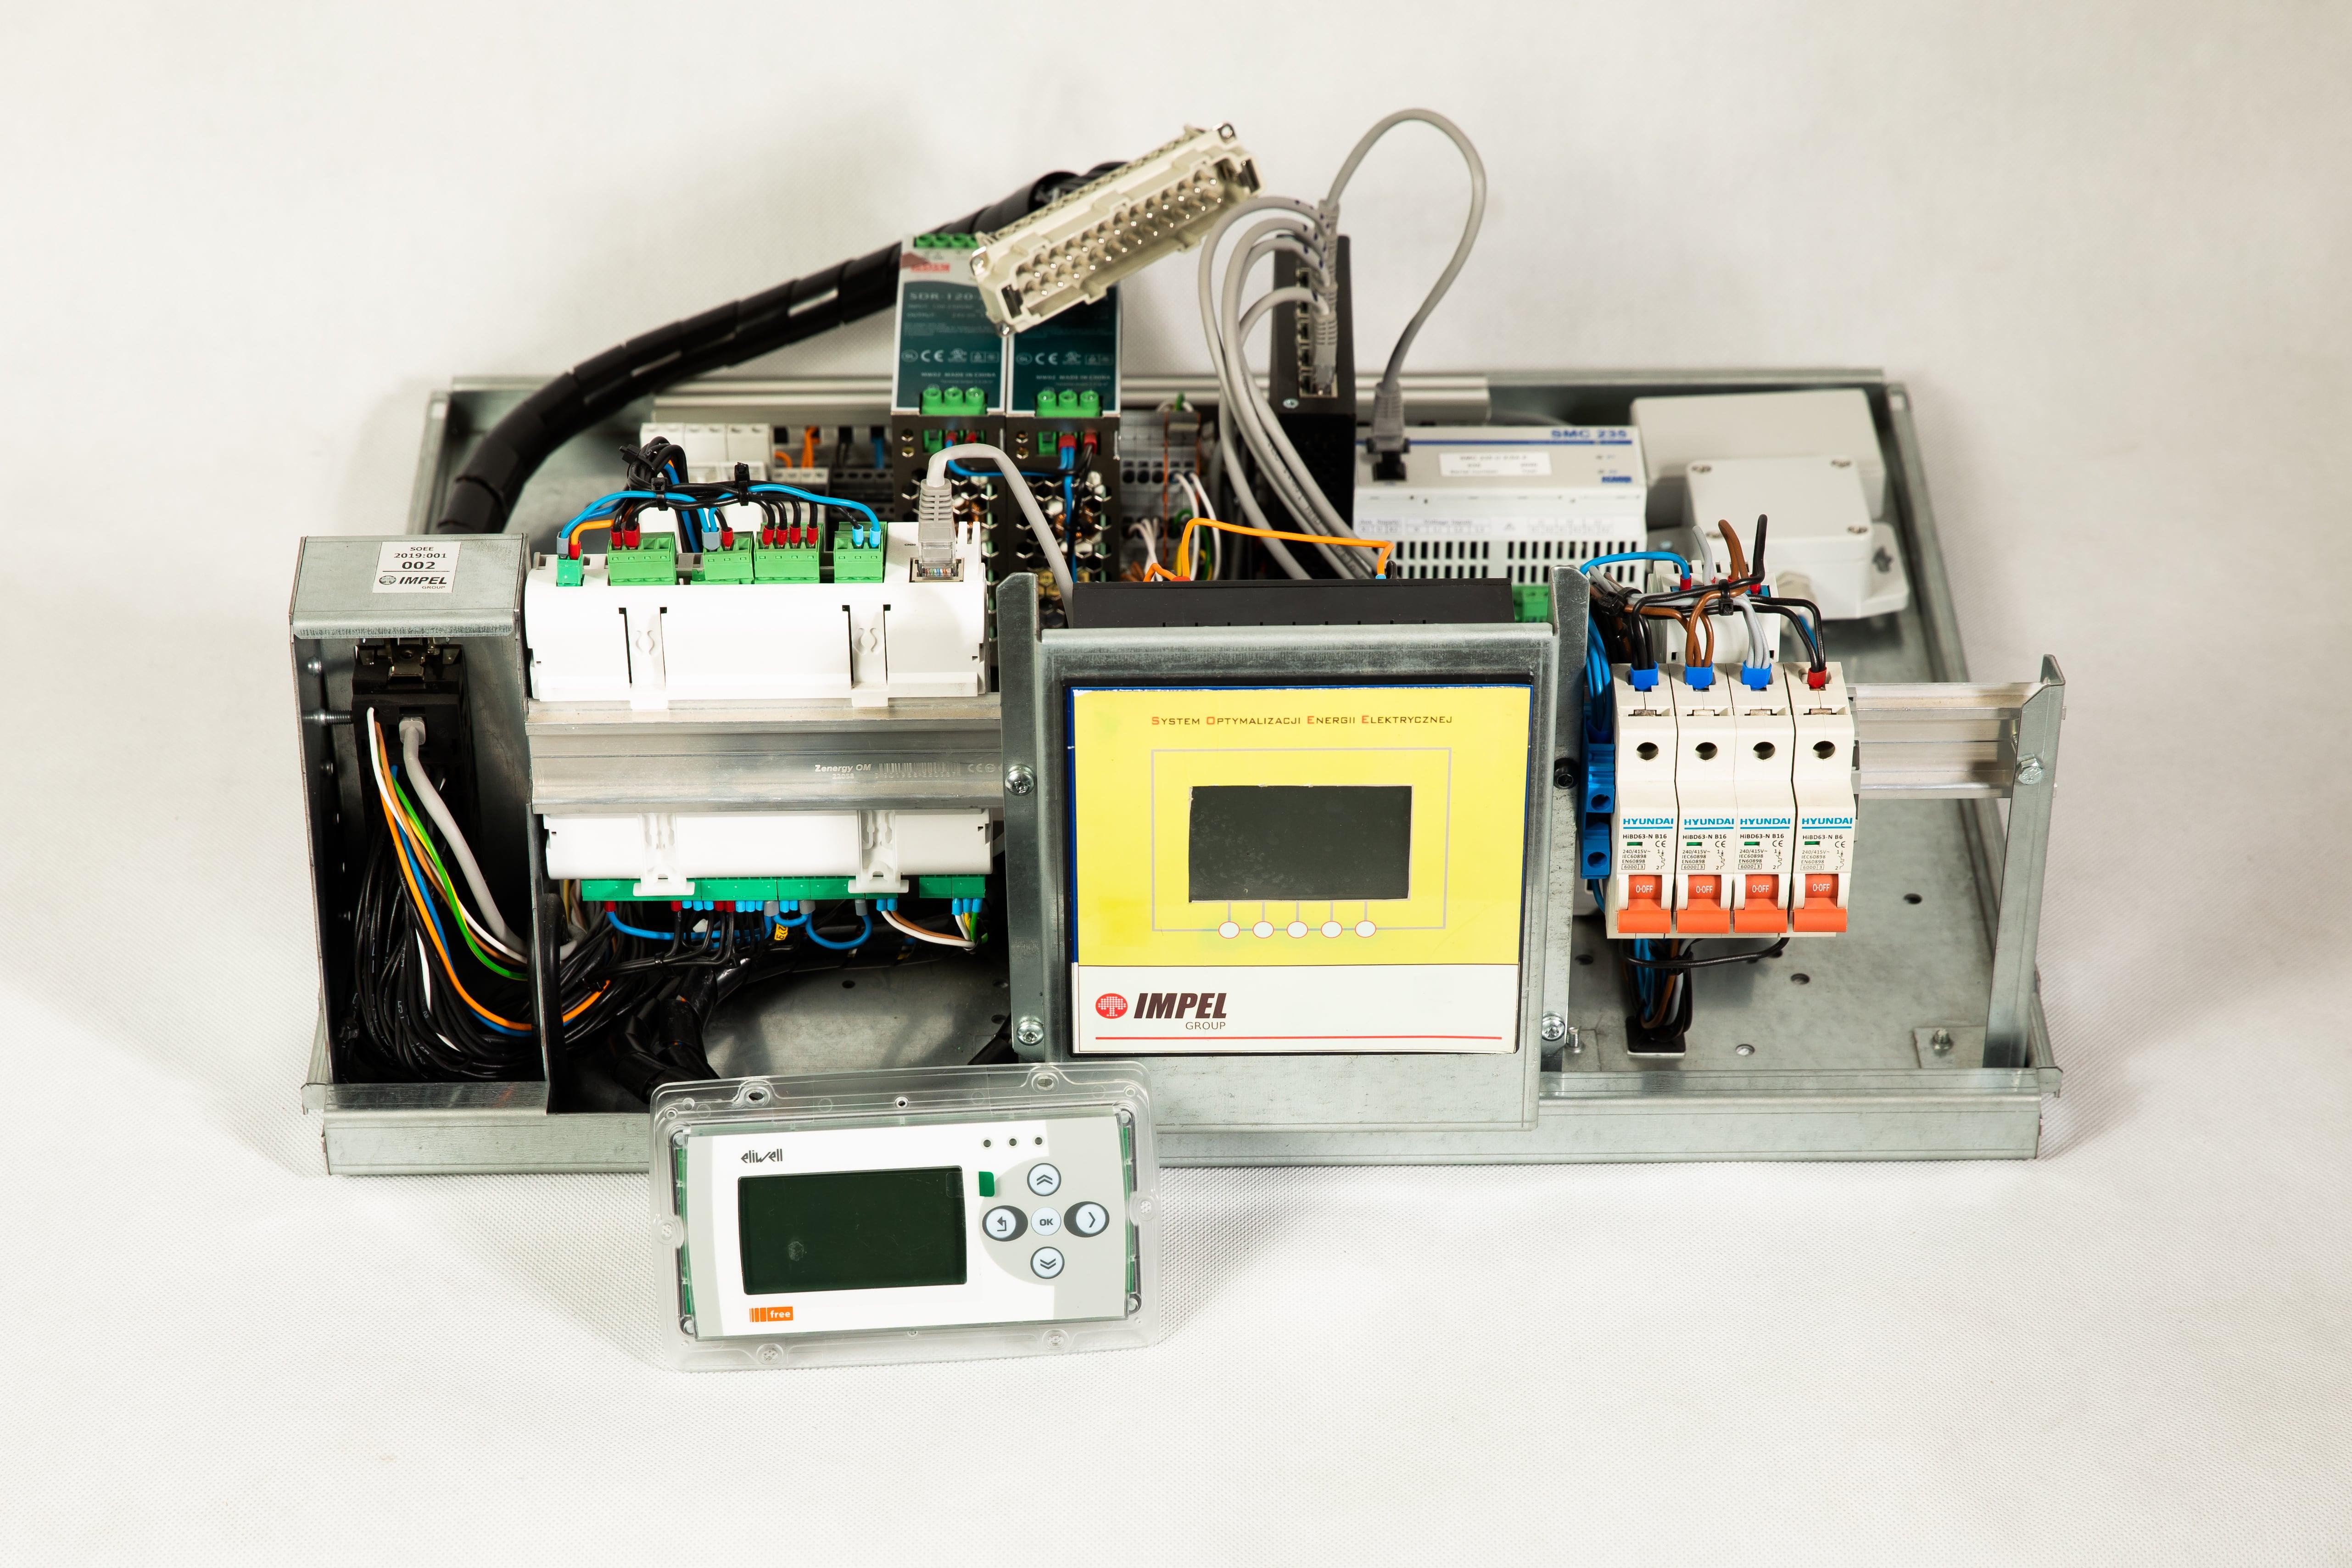 Instalacja pomiarowa systemu SOEE. Fot. Impel